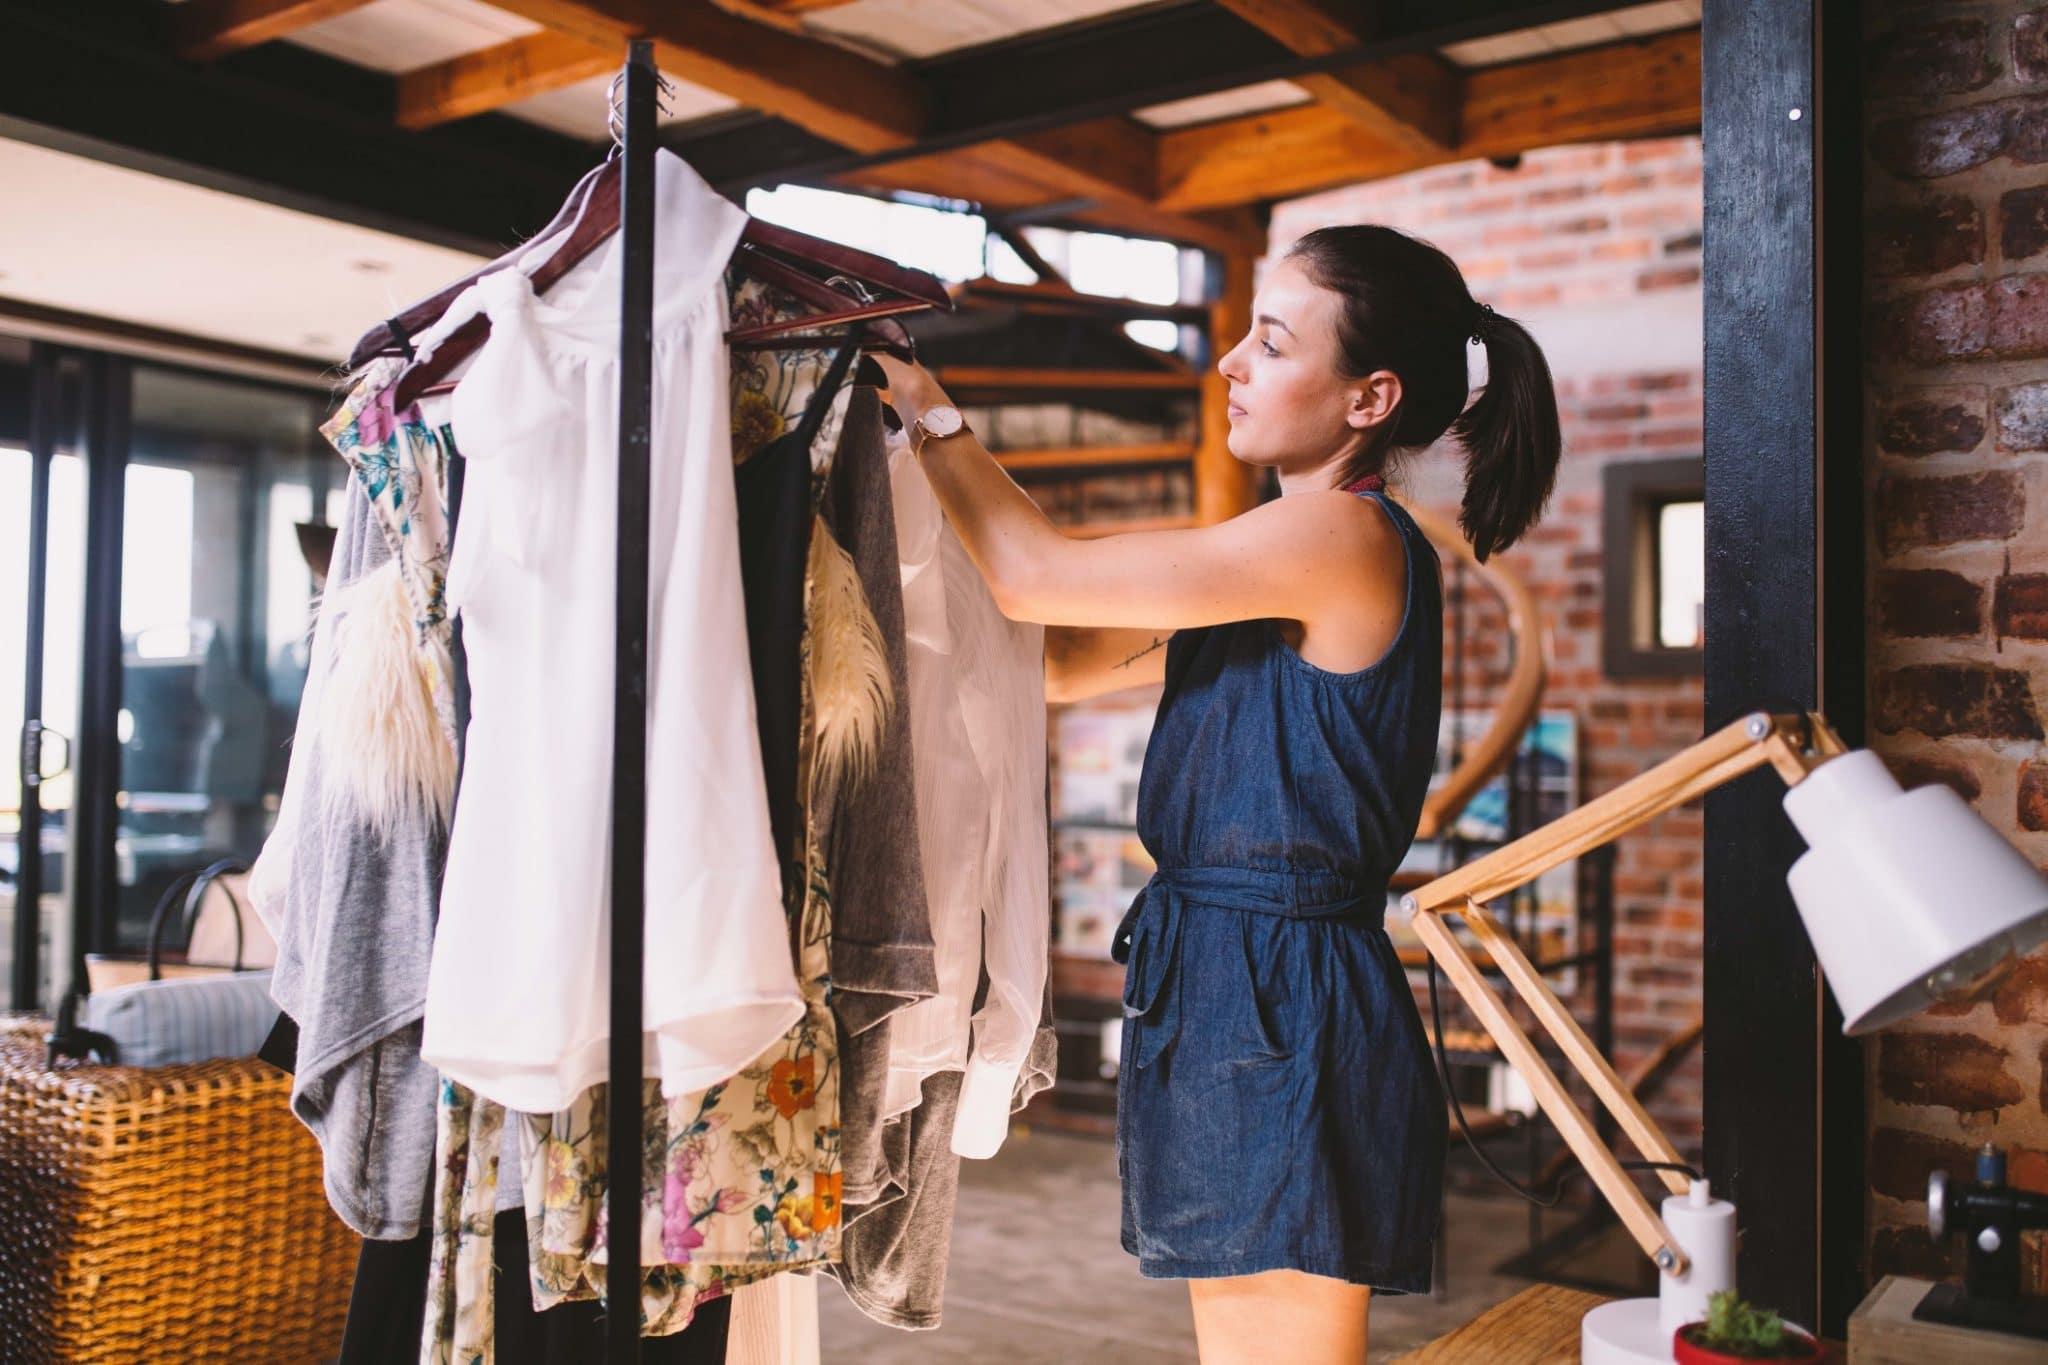 Femme faisant son shopping